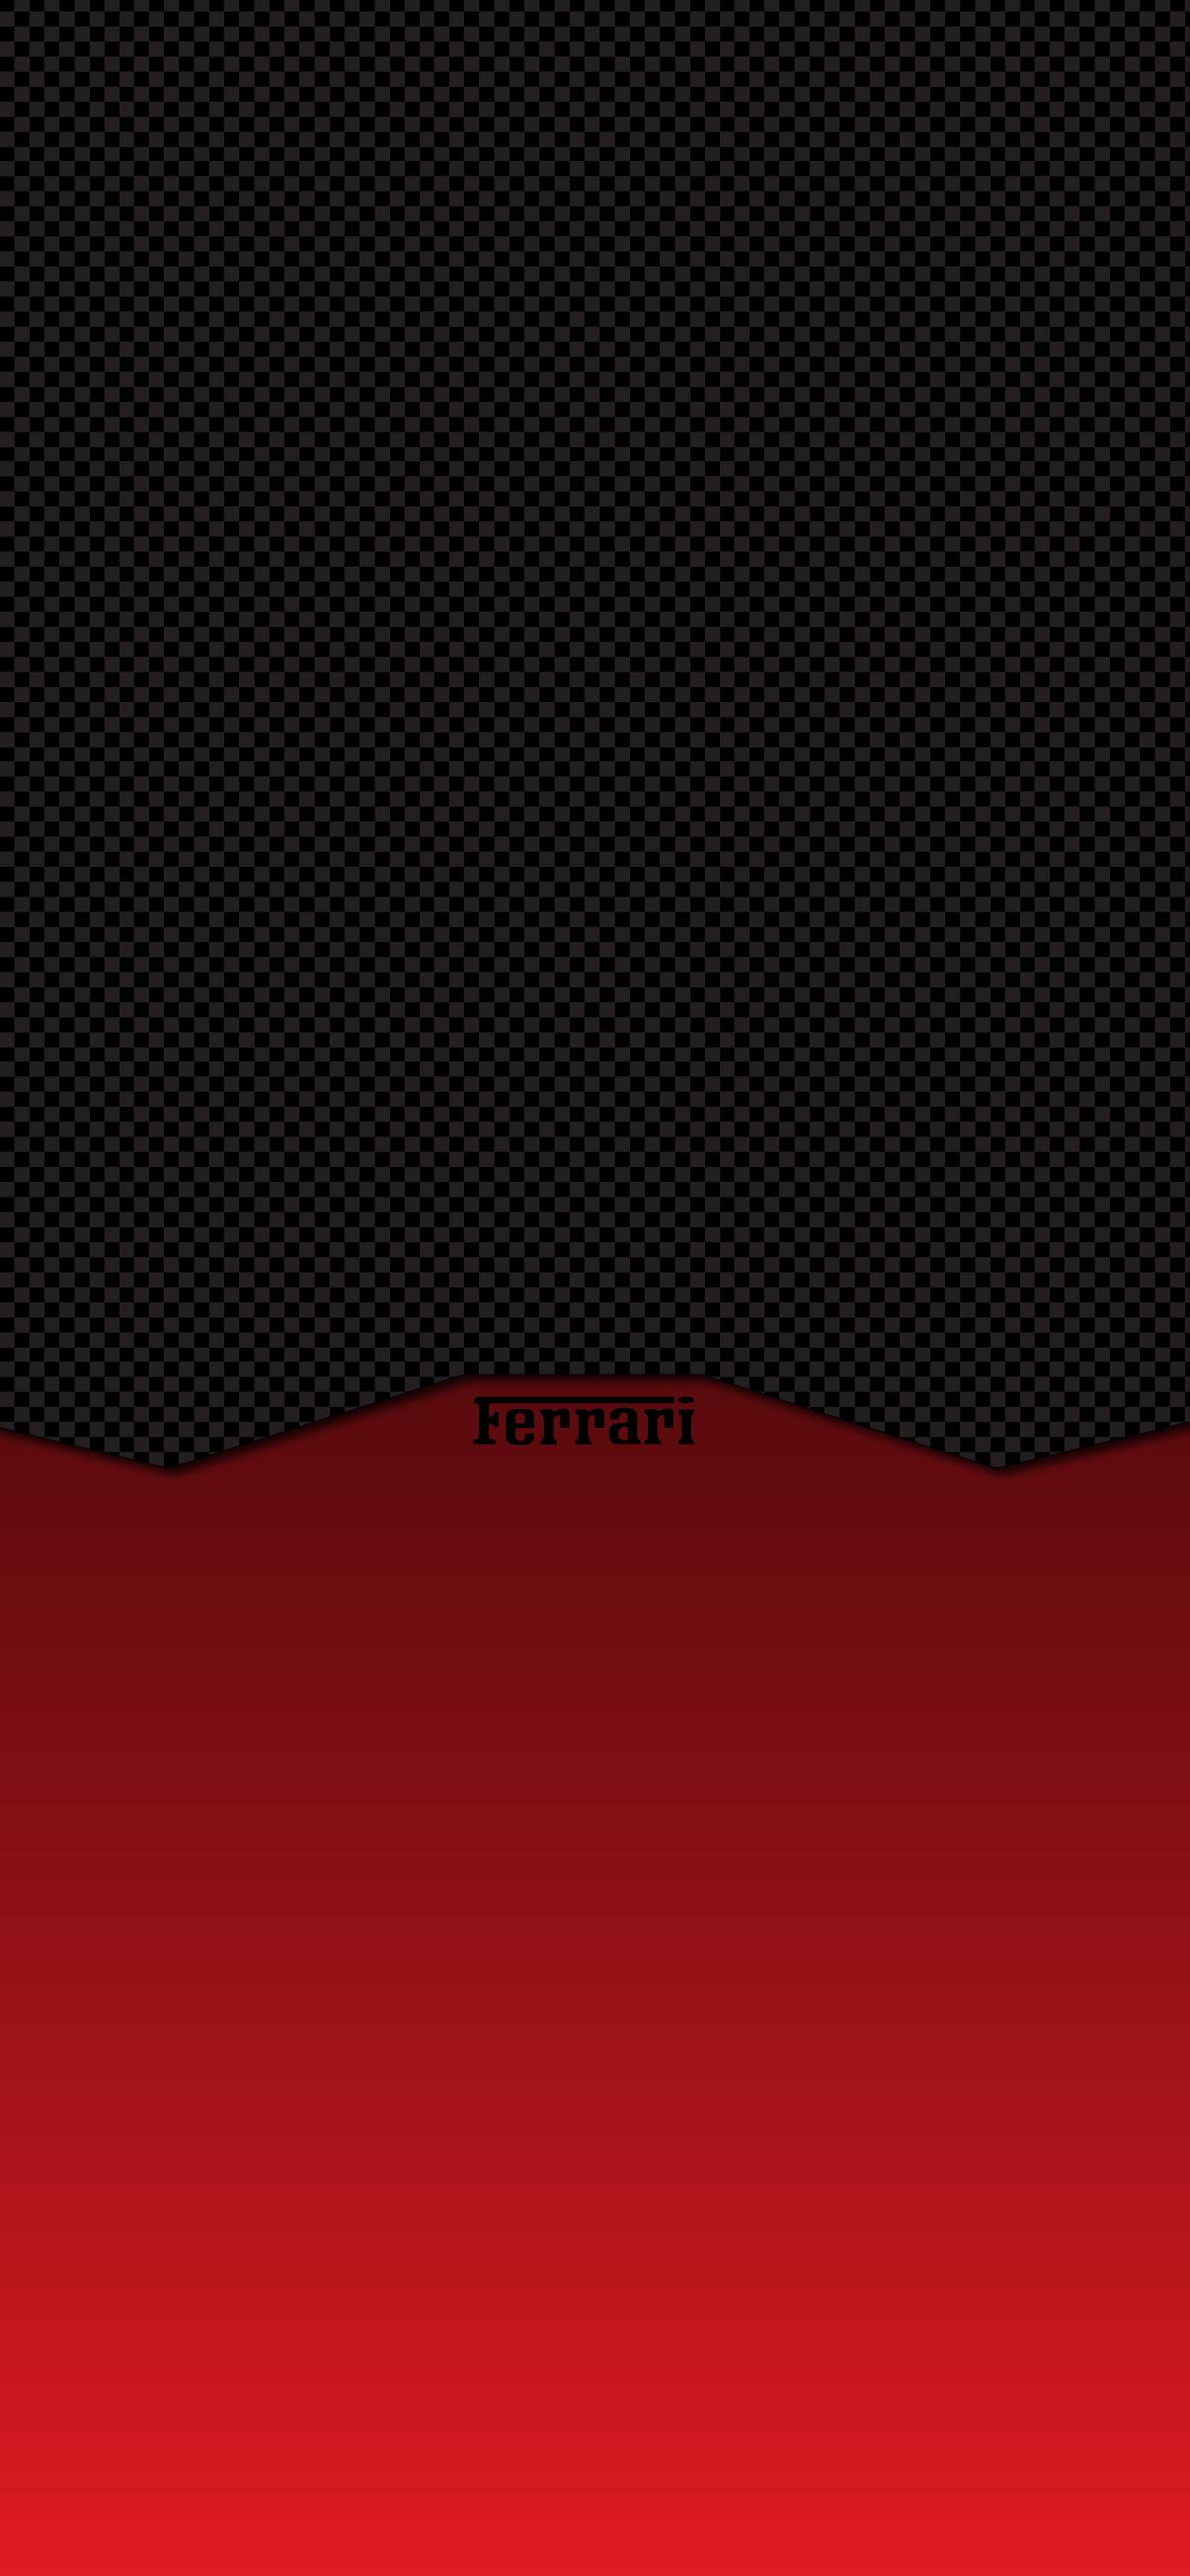 ferrari iphone wallpaper 4k luxury cool lock screen carbon fiber